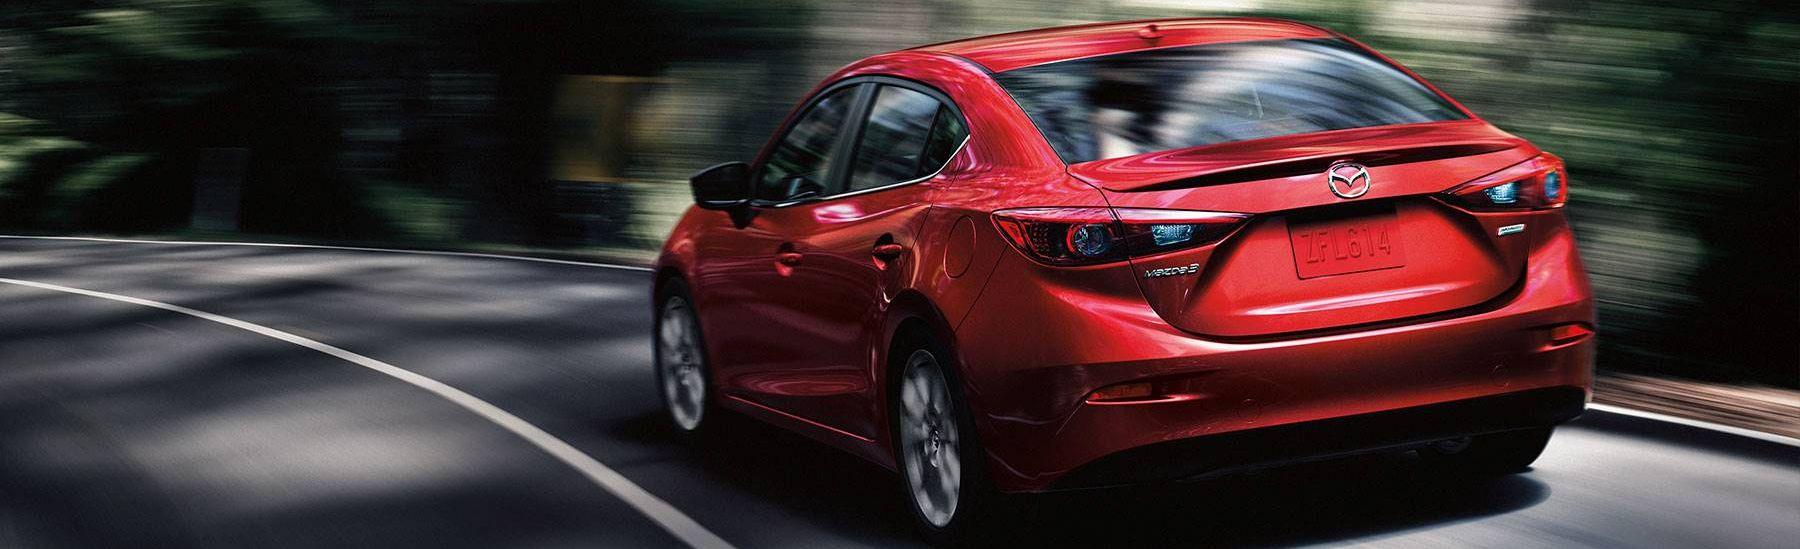 2018 Mazda3 Financing in Sacramento, CA